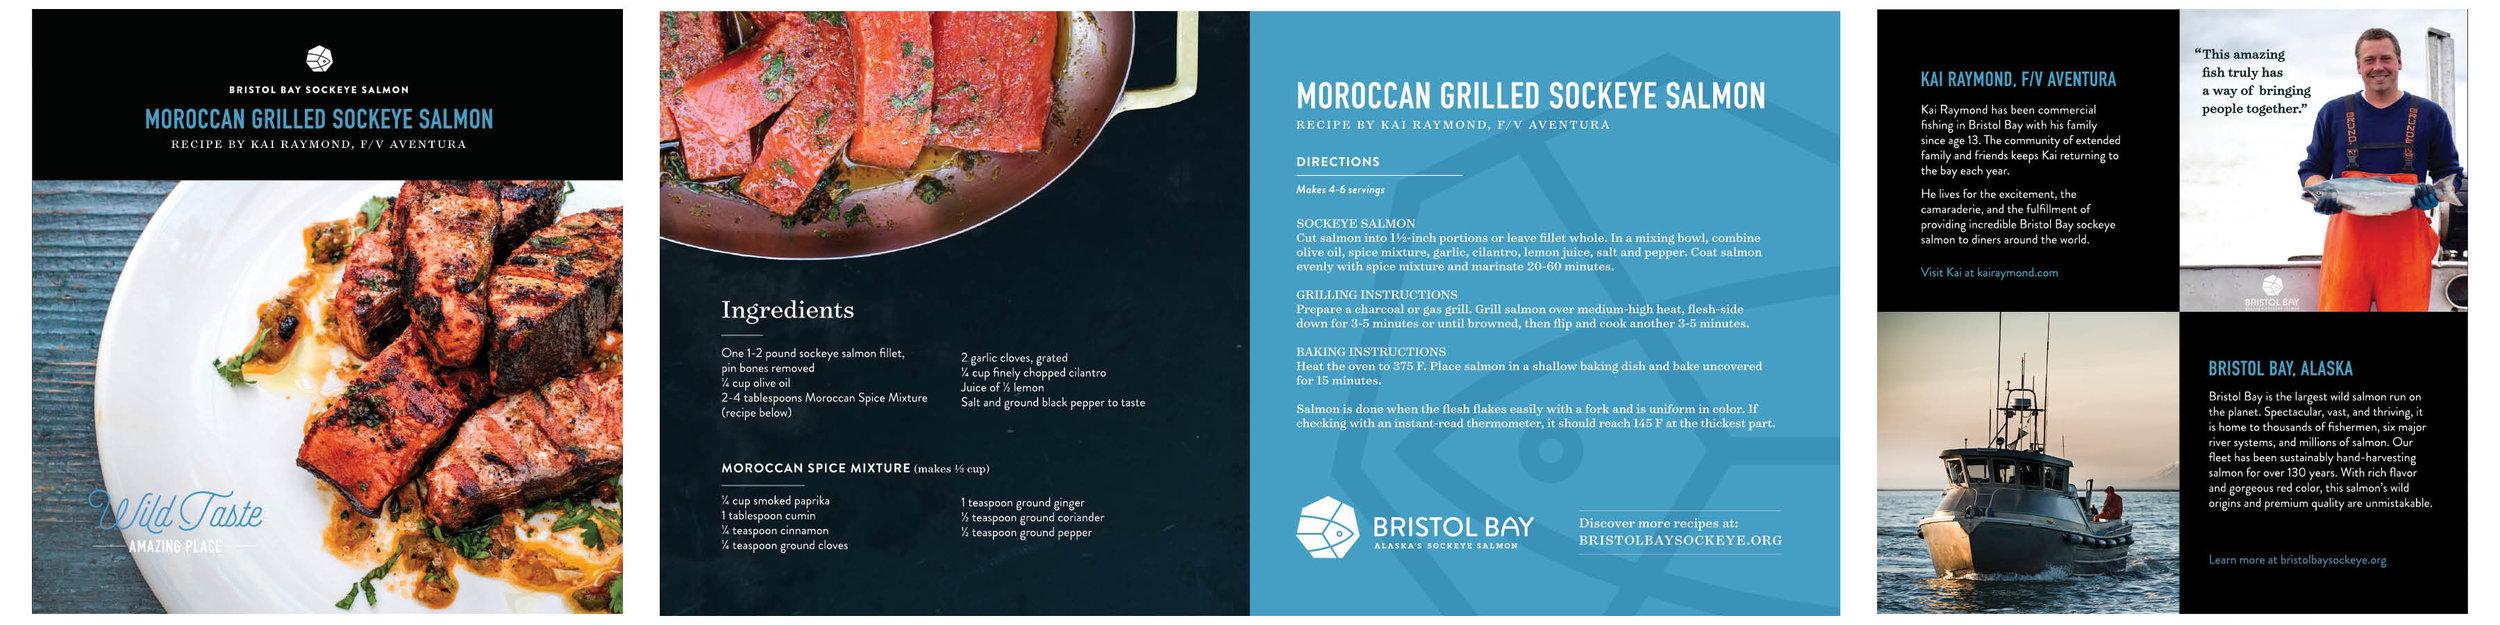 Direct Marketer Order Form \u2014 Bristol Bay Sockeye Salmon